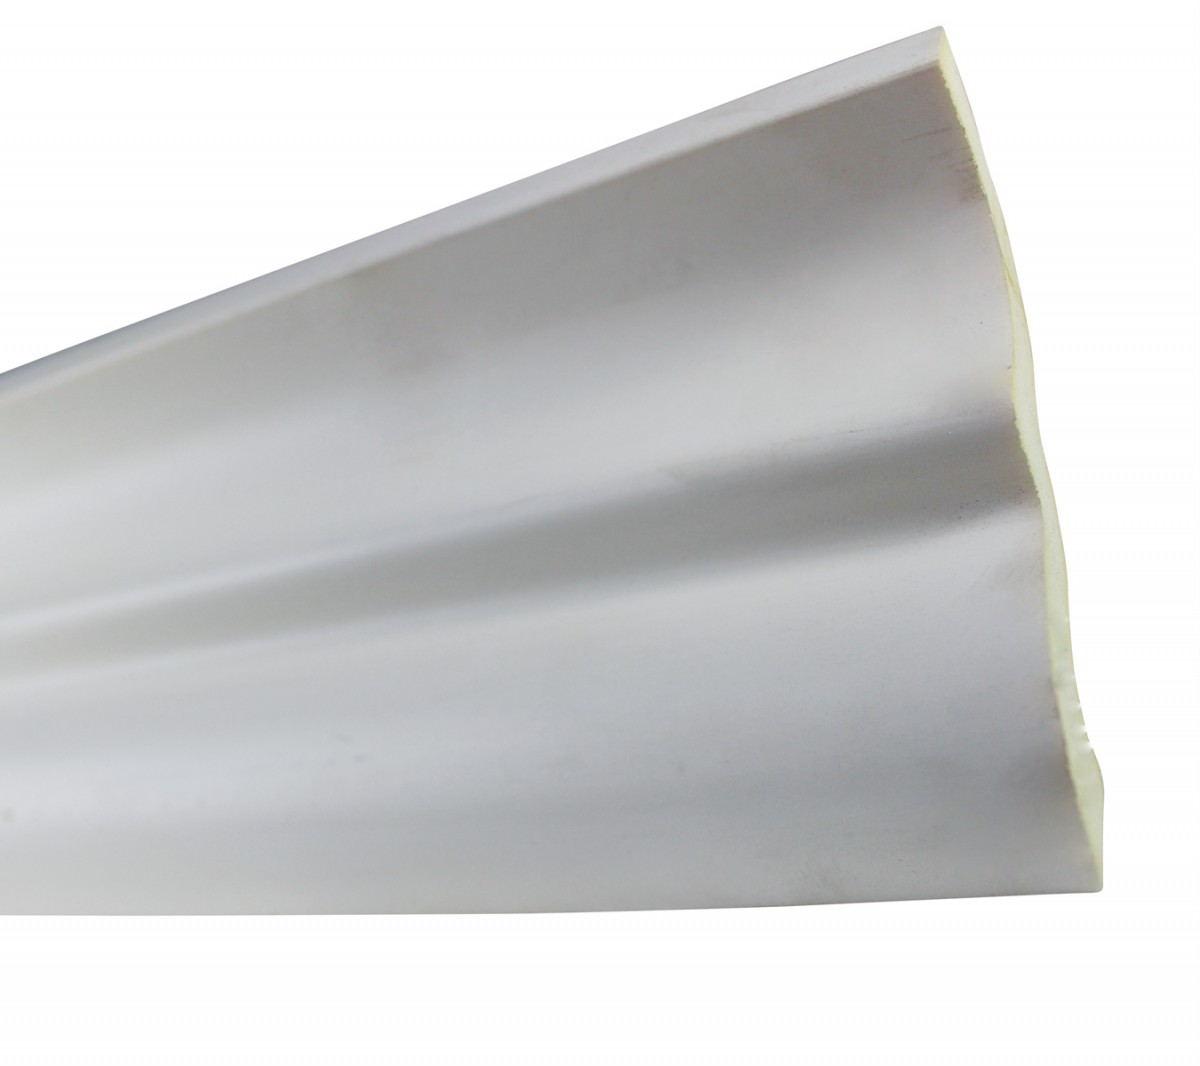 Cornice White Urethane 23.5 Sample of 11777 Cornice Cornice Moulding Cornice Molding